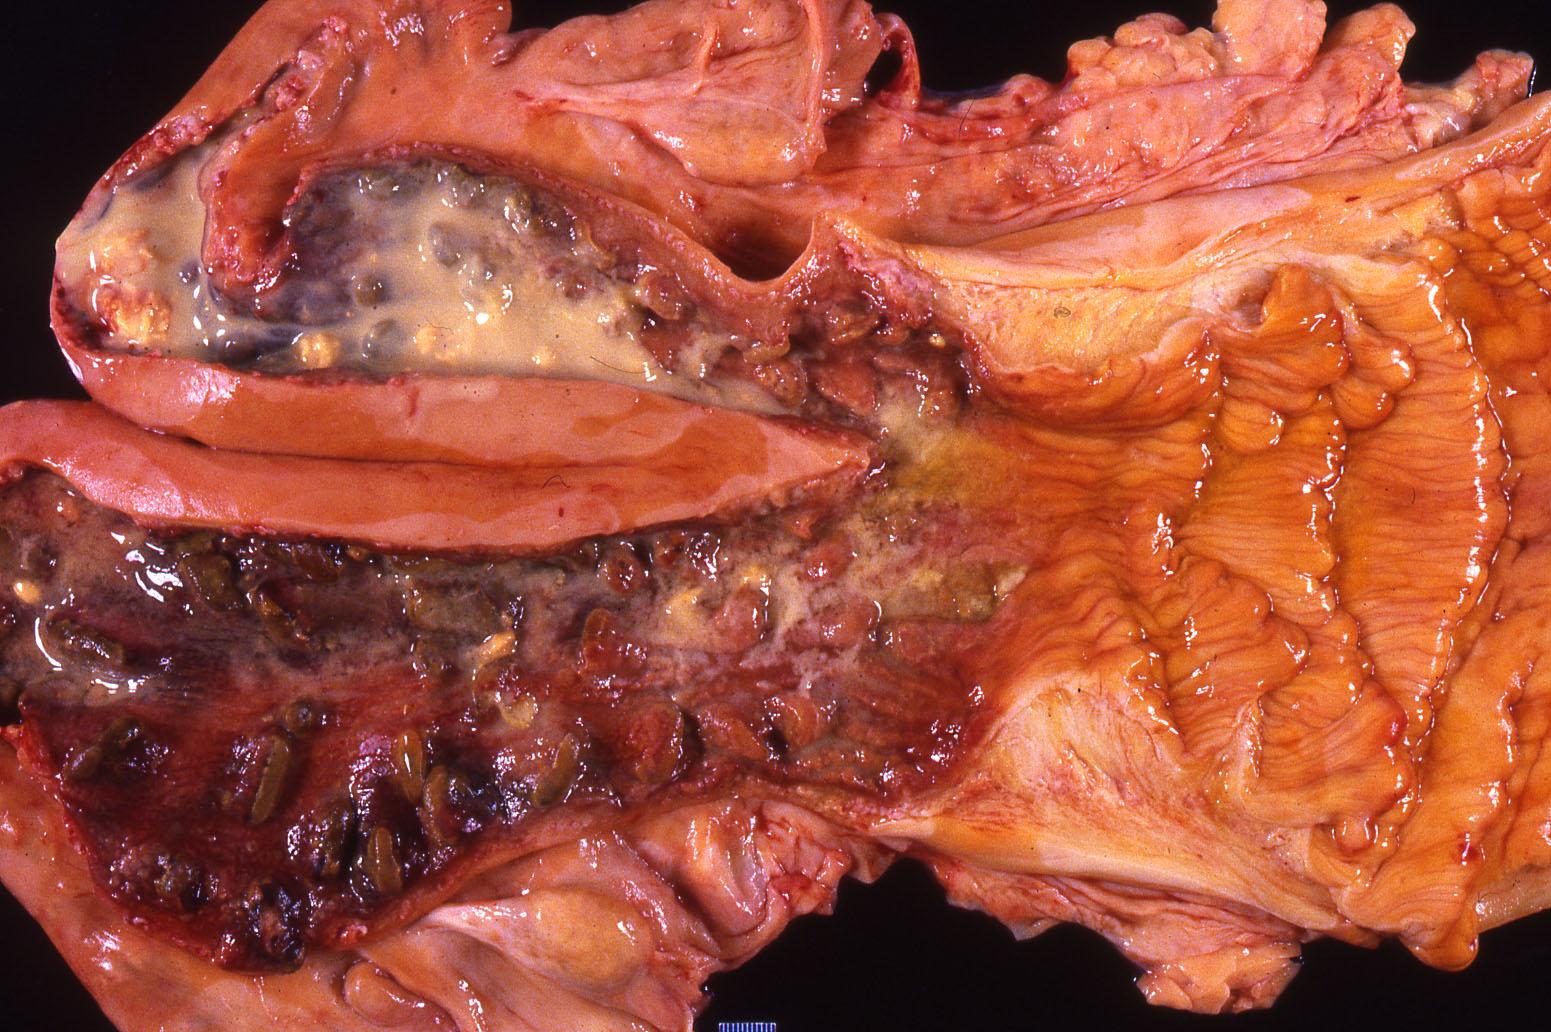 Kəskin endometrit